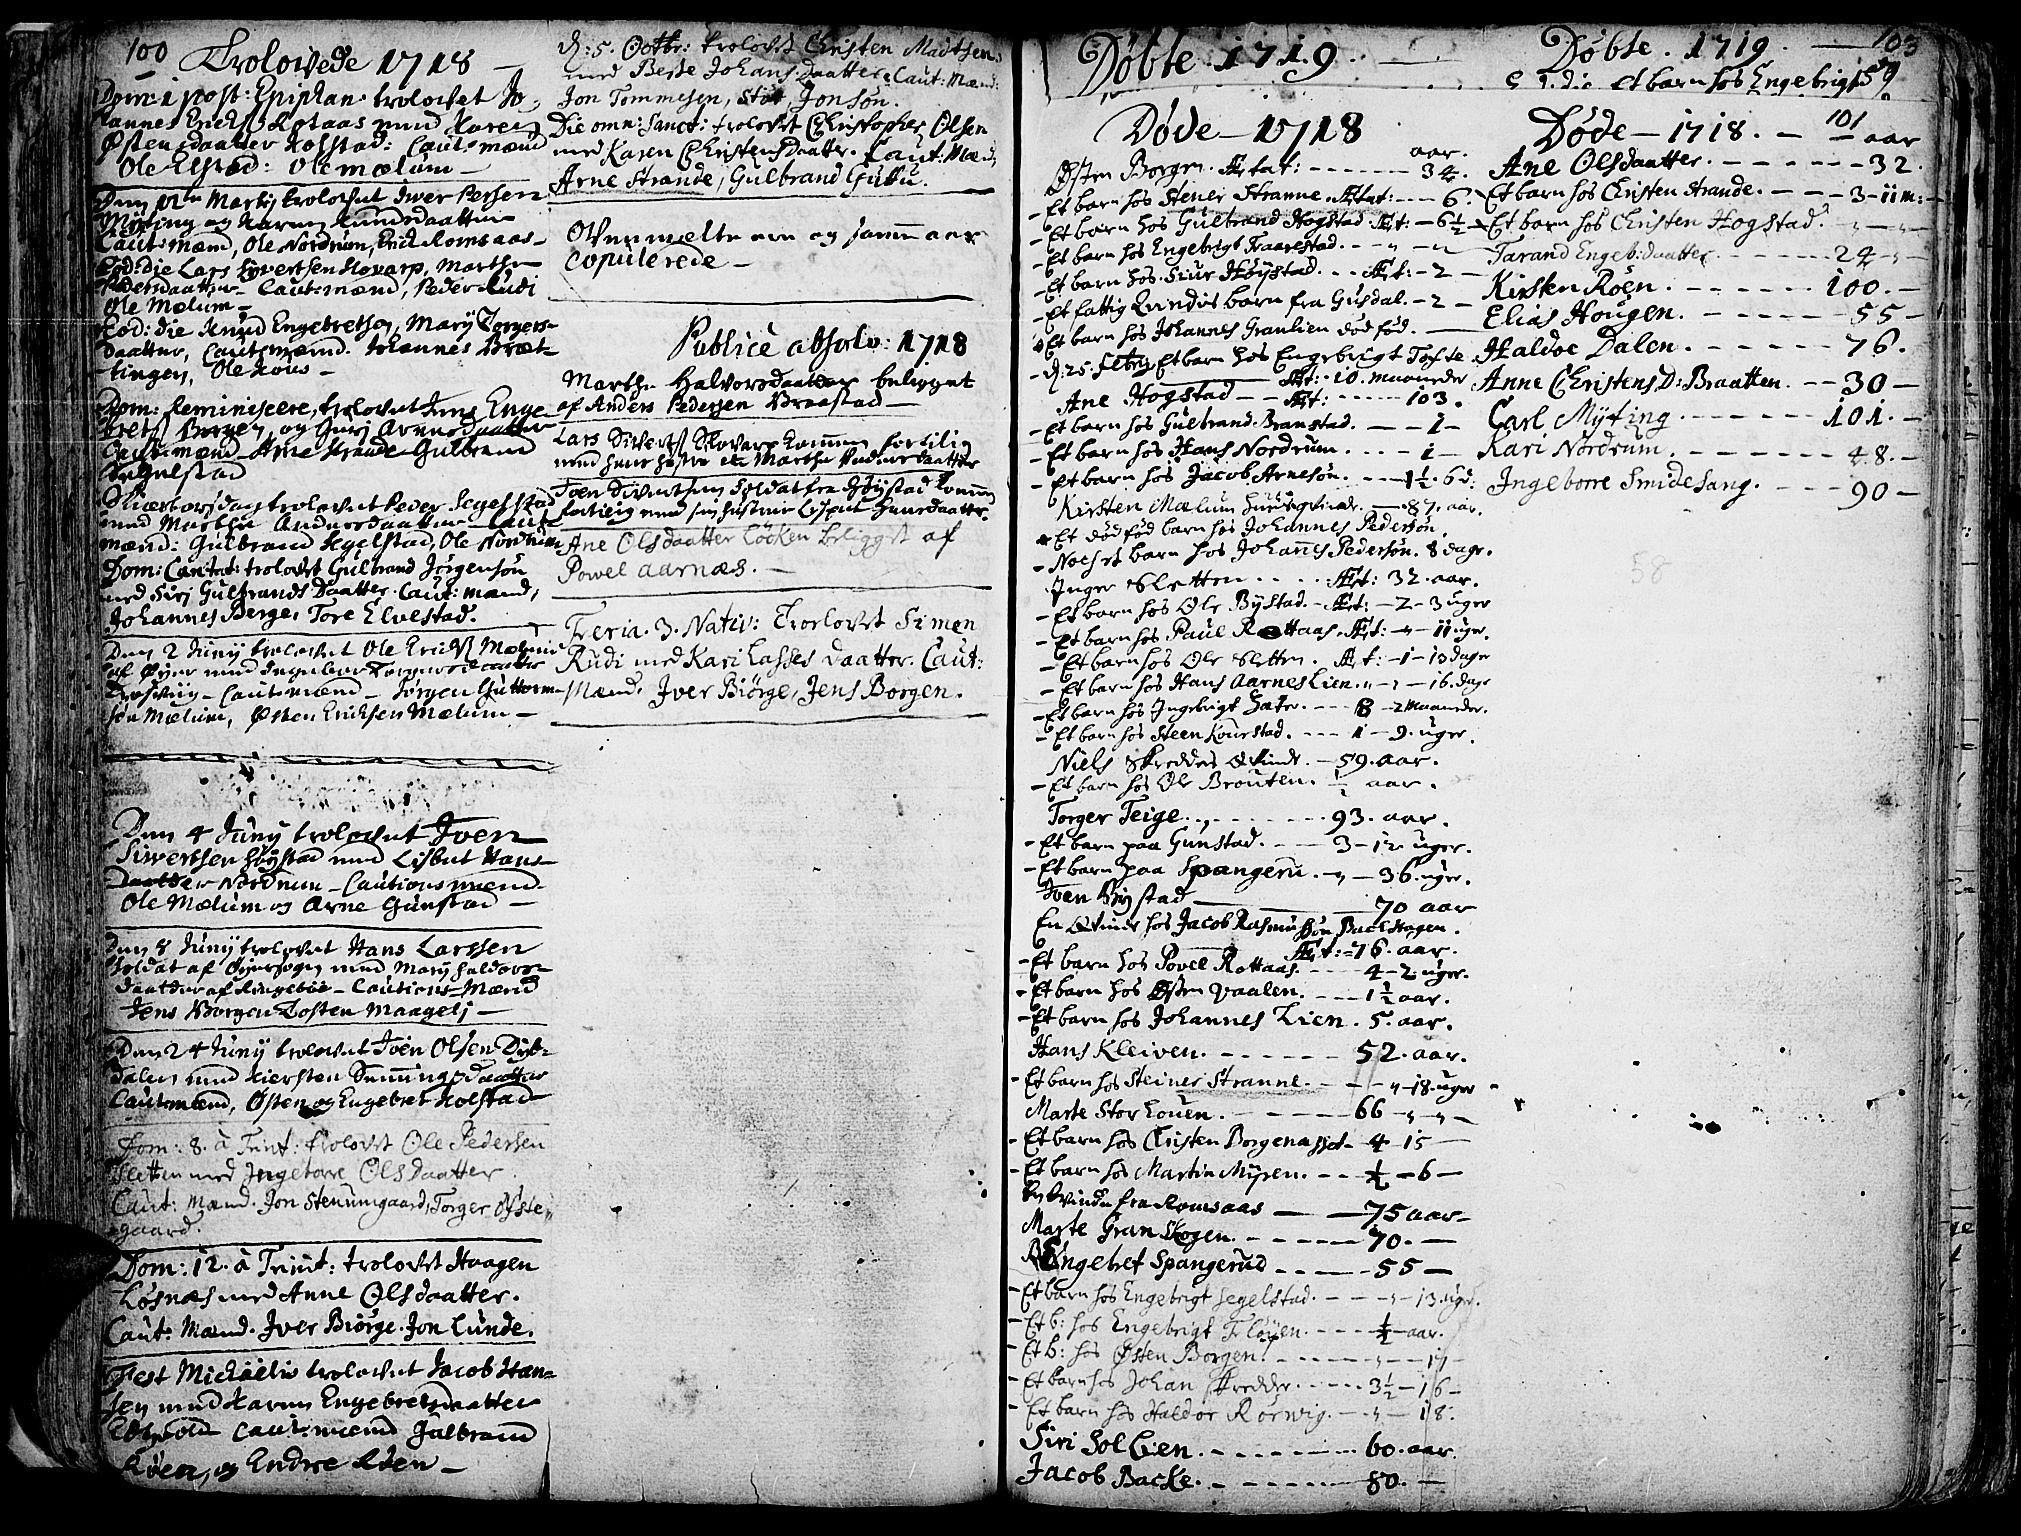 SAH, Ringebu prestekontor, Ministerialbok nr. 1, 1696-1733, s. 100-101